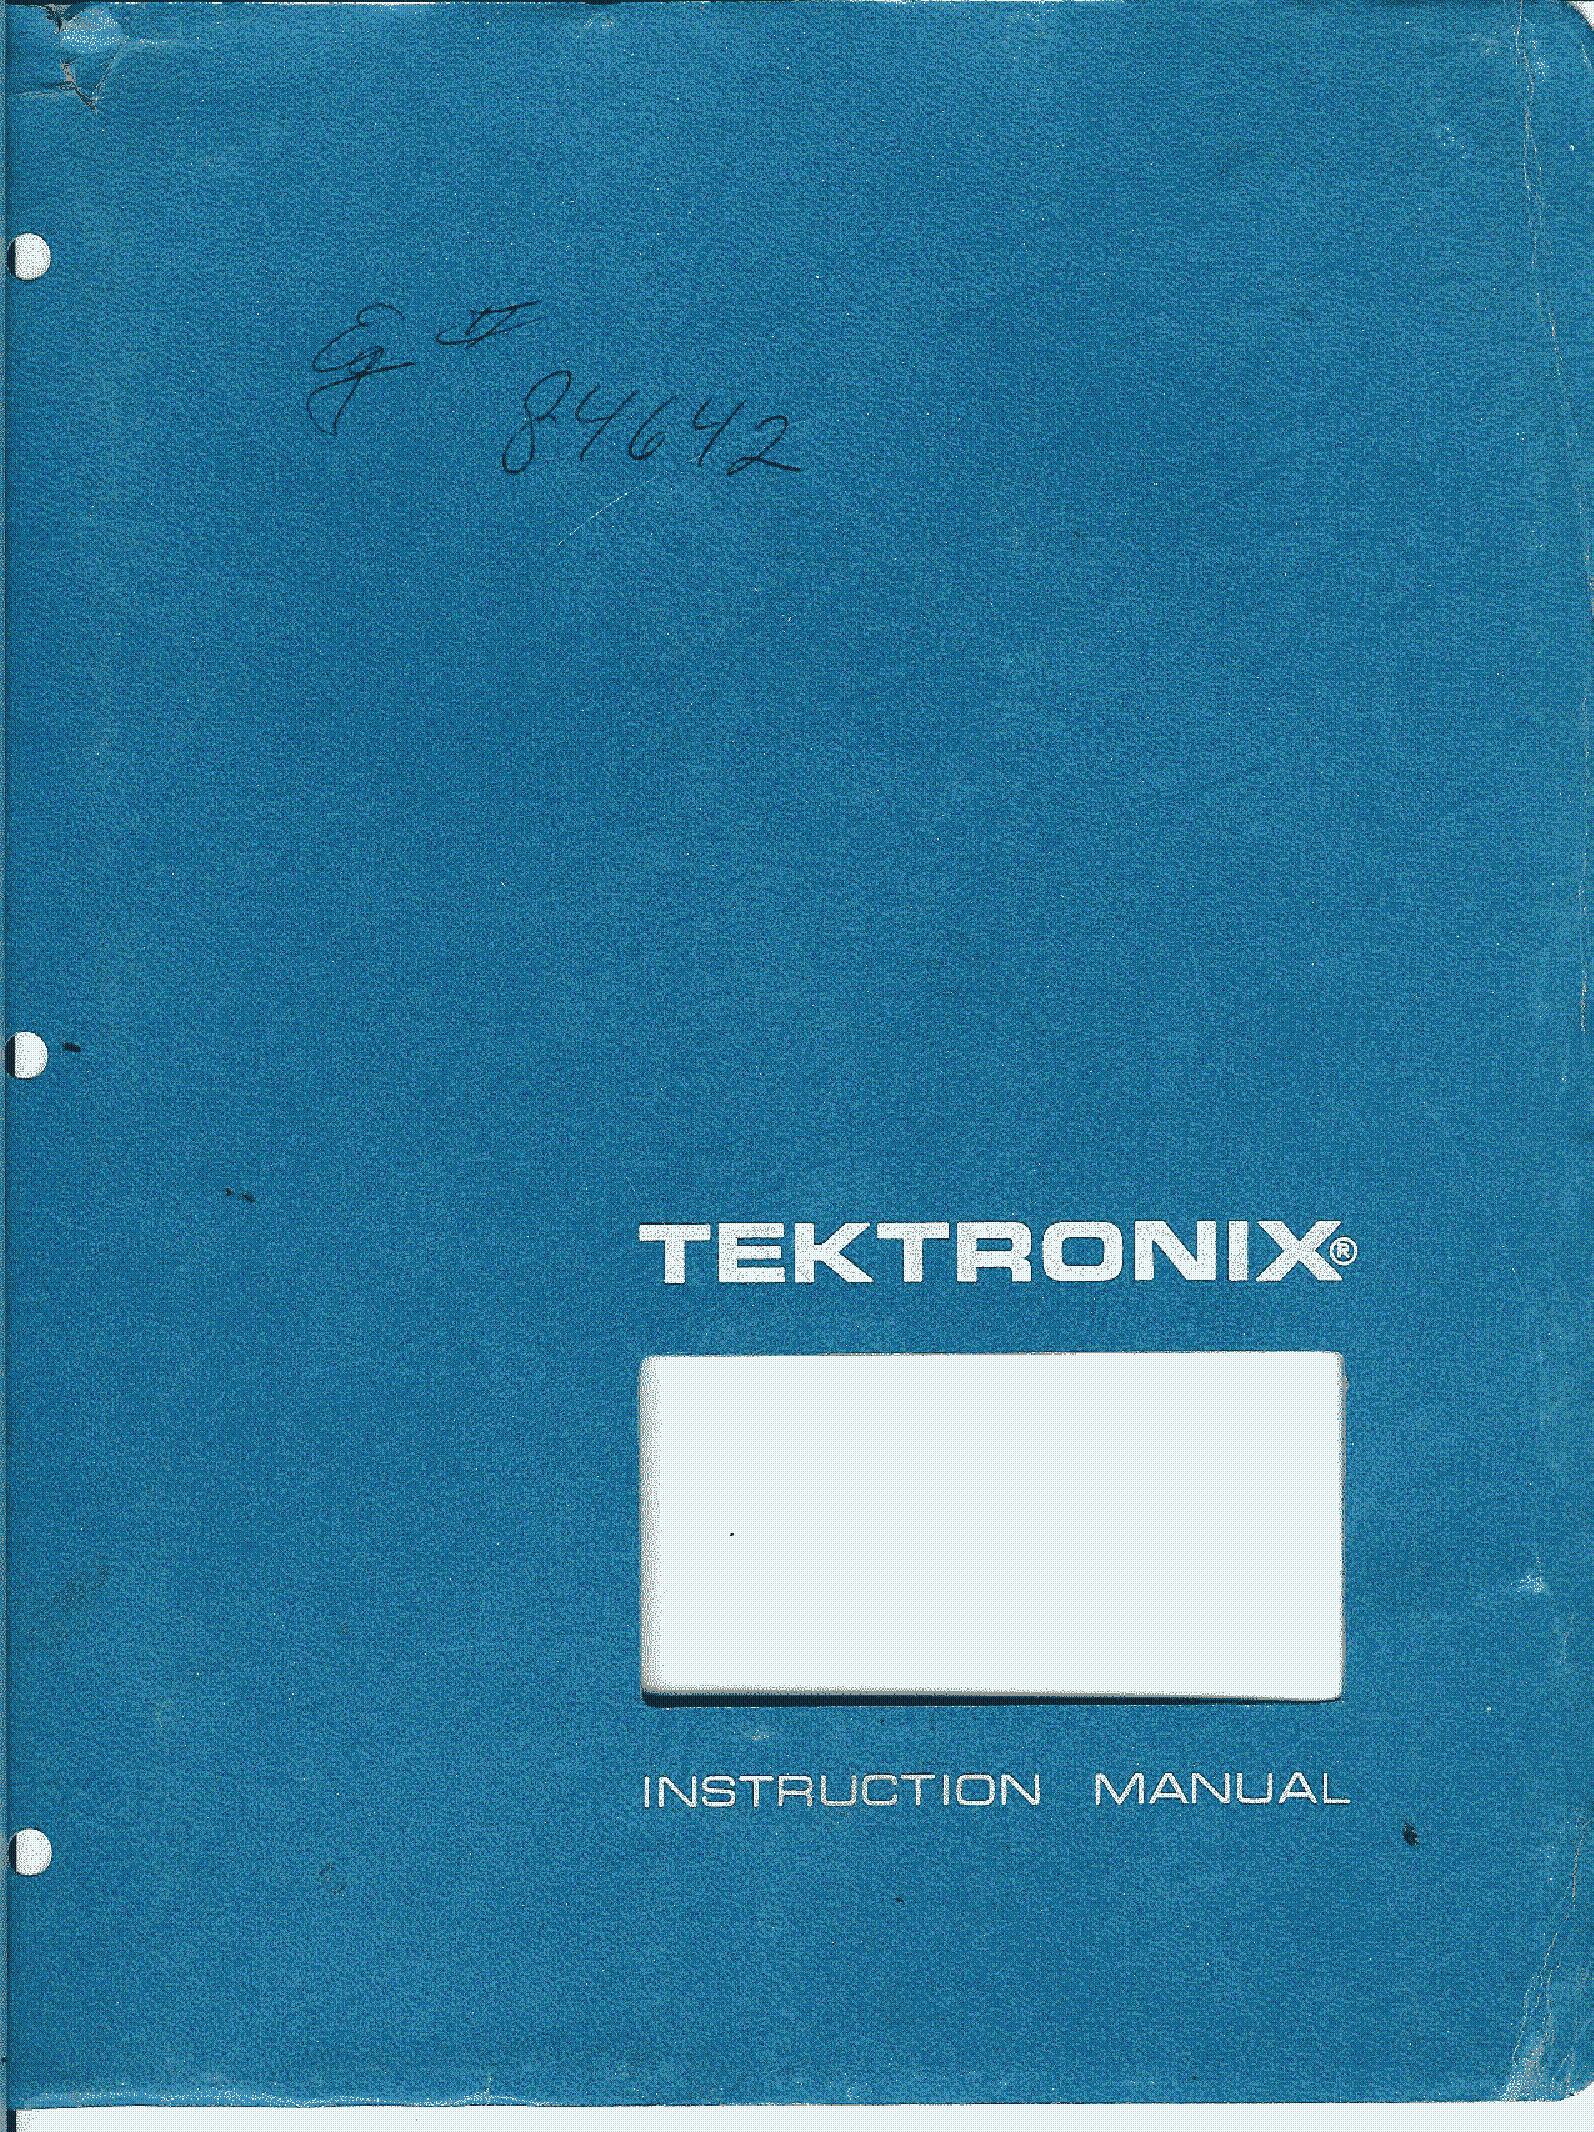 tektronix 465 oscilloscope full sm service manual download rh elektrotanya com tektronix 465 manual service tektronix 465b manual pdf